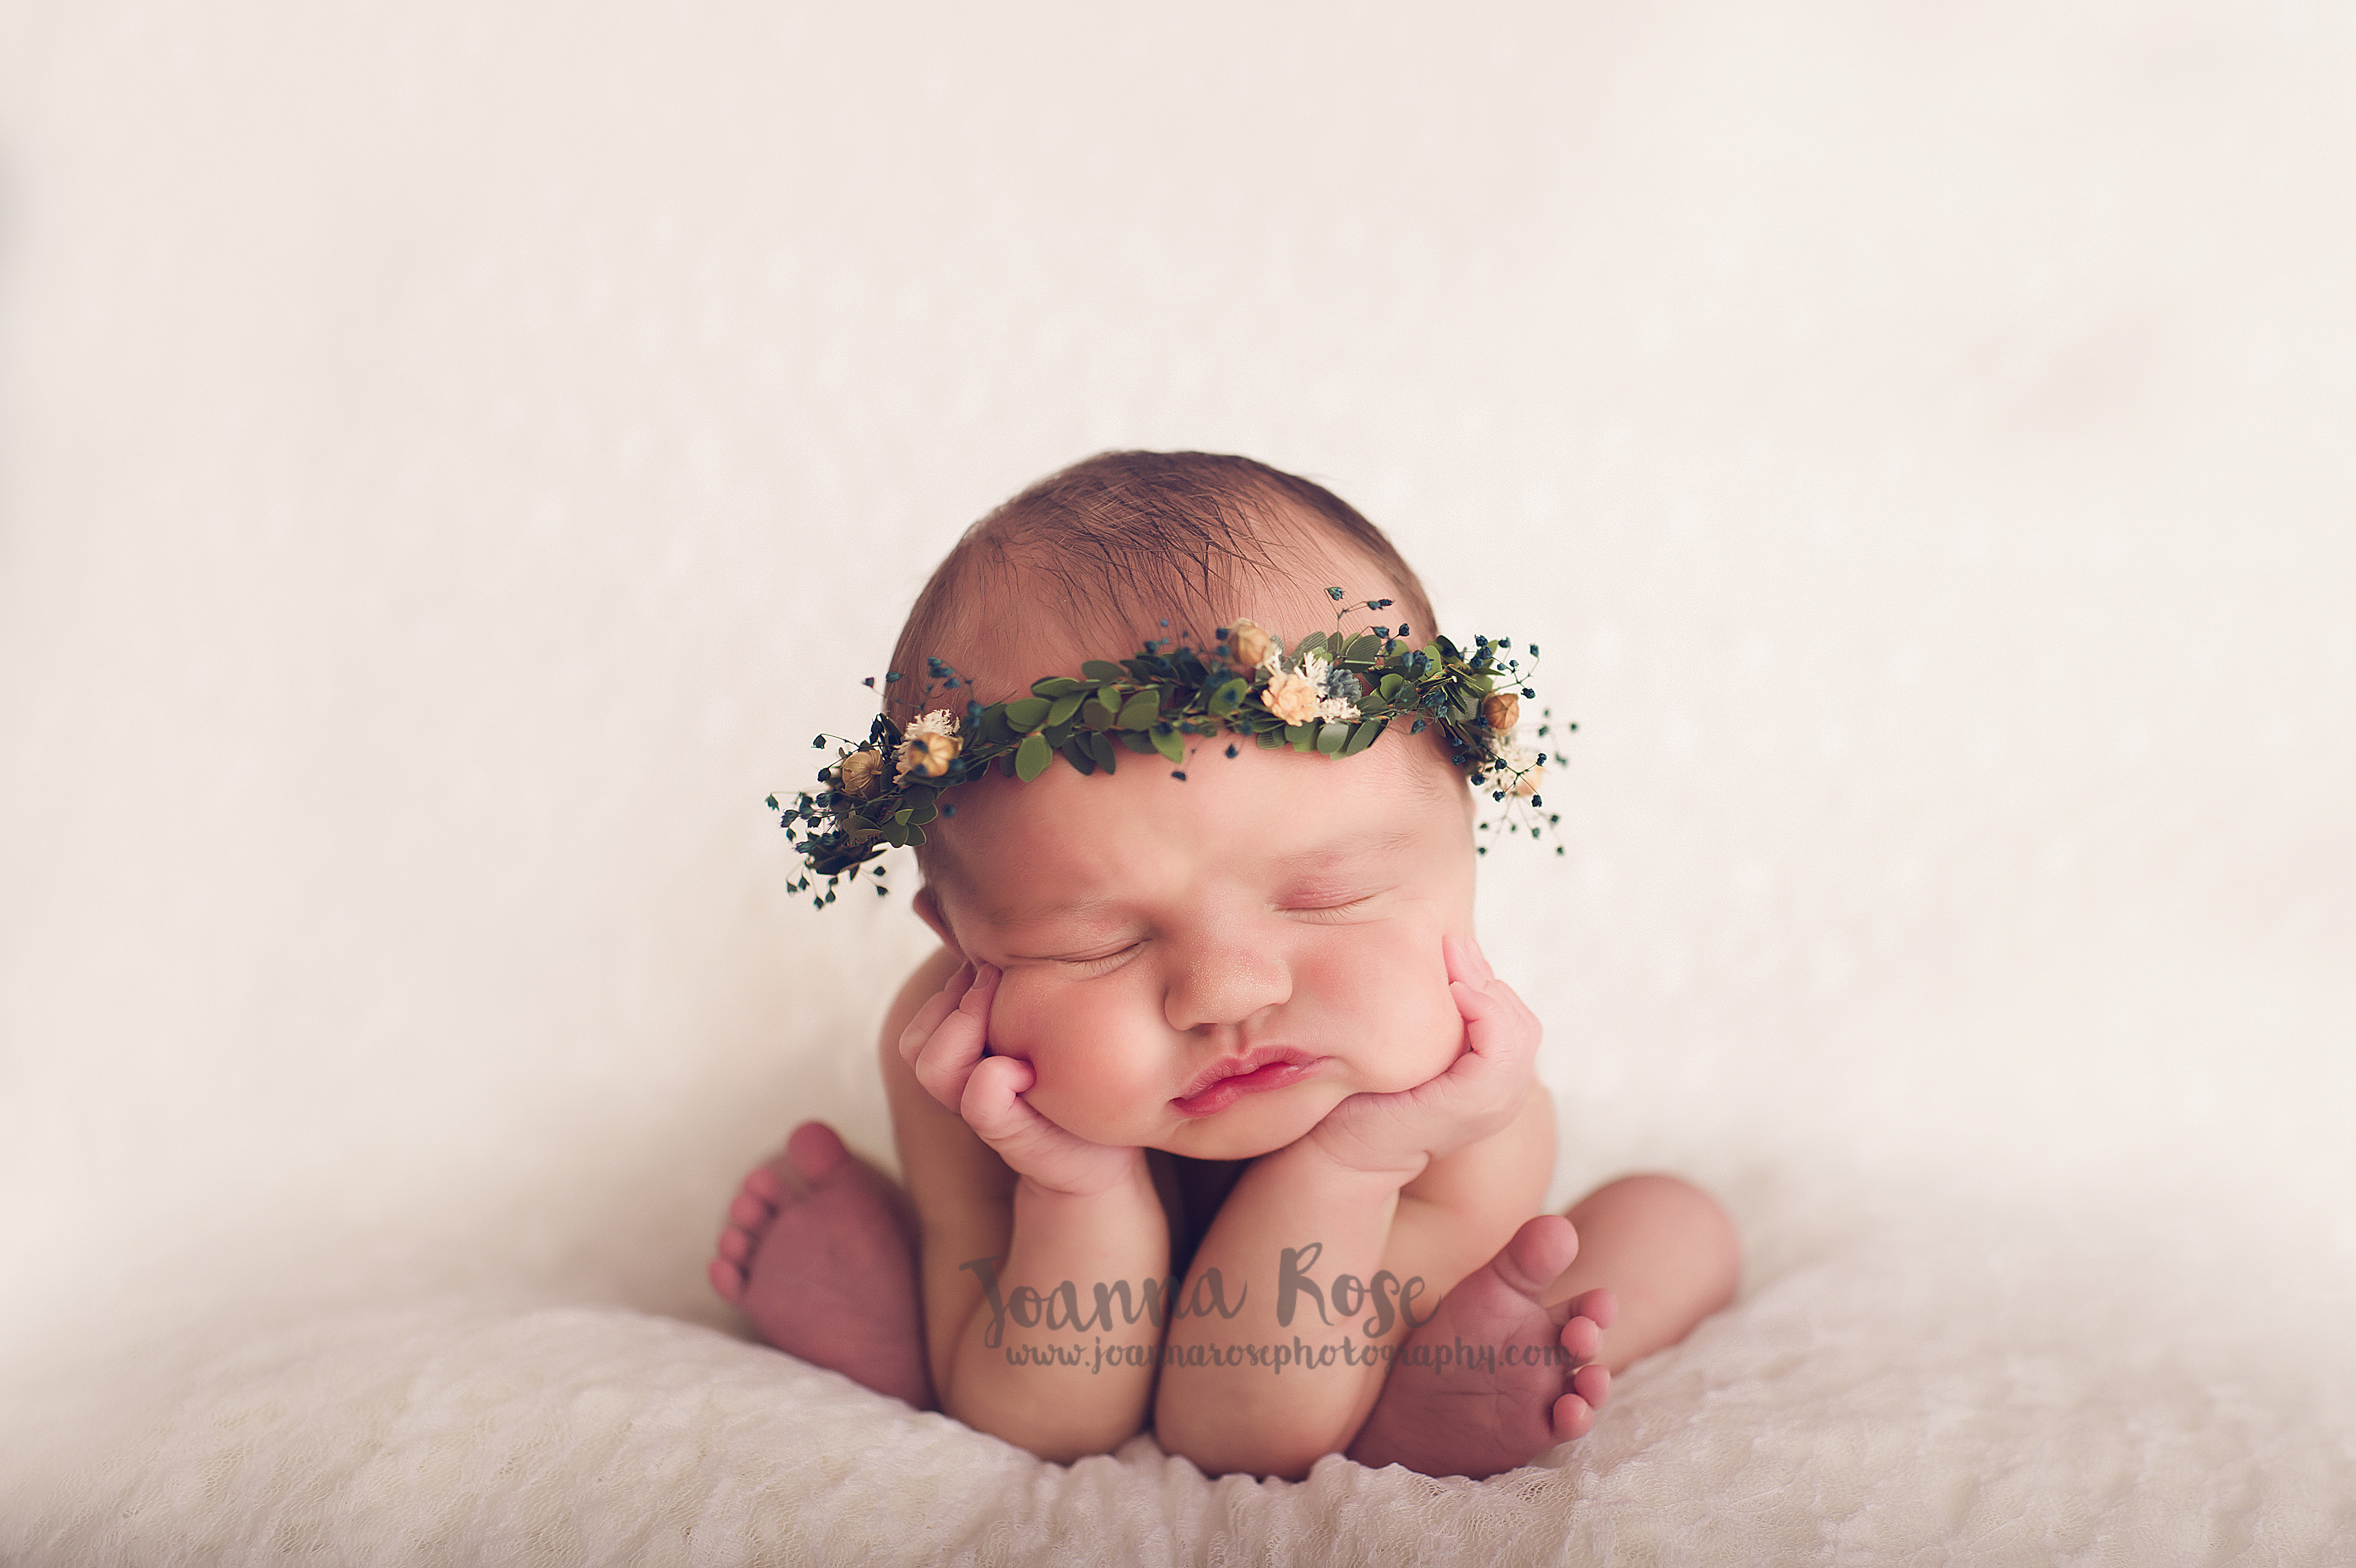 Newborn Baby Photography Liverpool & Liverpool Newborn Baby Photographer & Family Photography Liverpool & Liverpool Family Photographer & Joanna Rose Photography